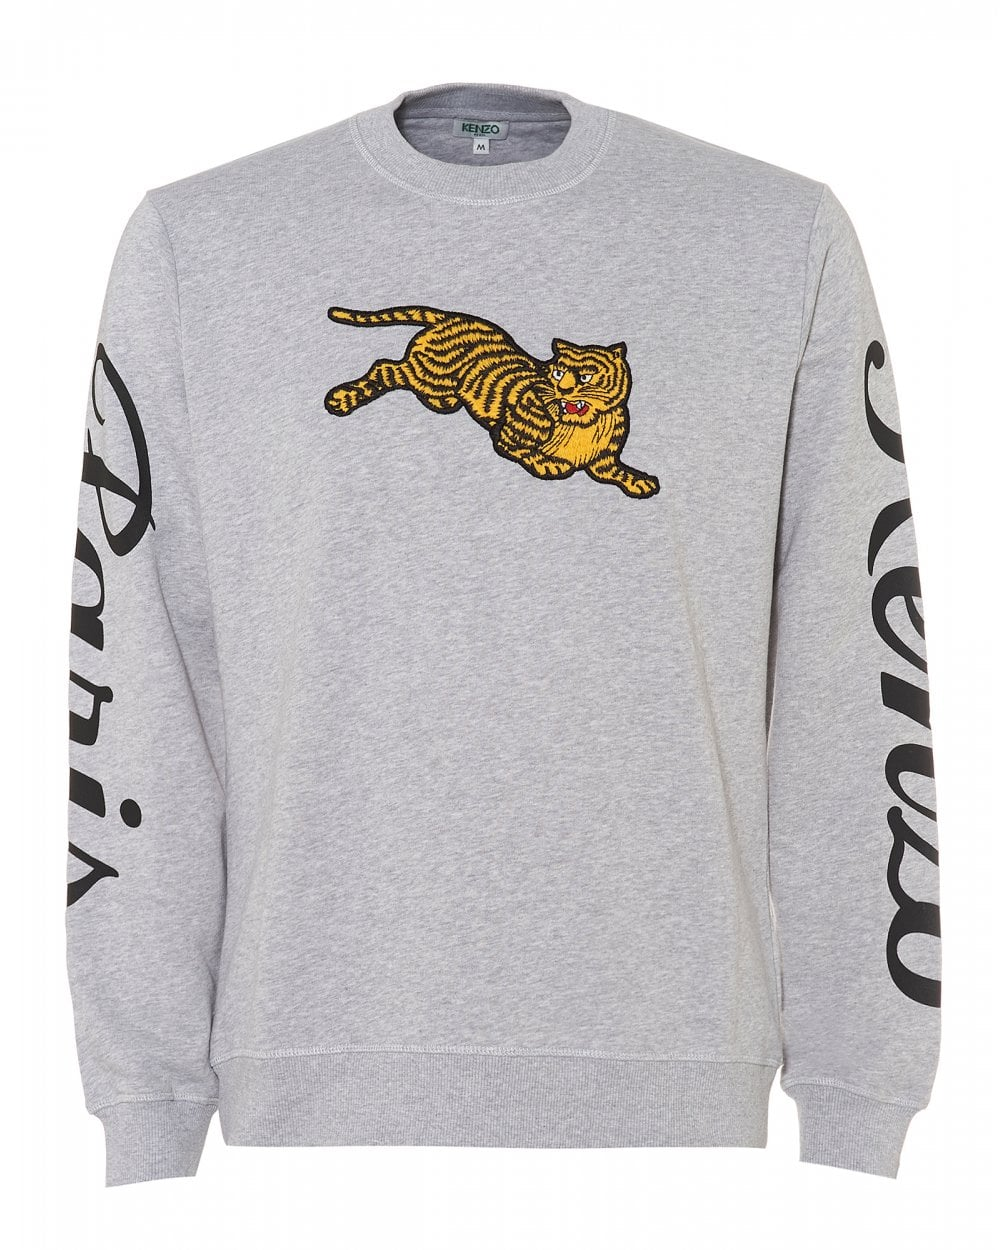 Kenzo Mens Jumping Tiger Sweatshirt, Pearl Grey Crew Neck Sweat d7211a0c857